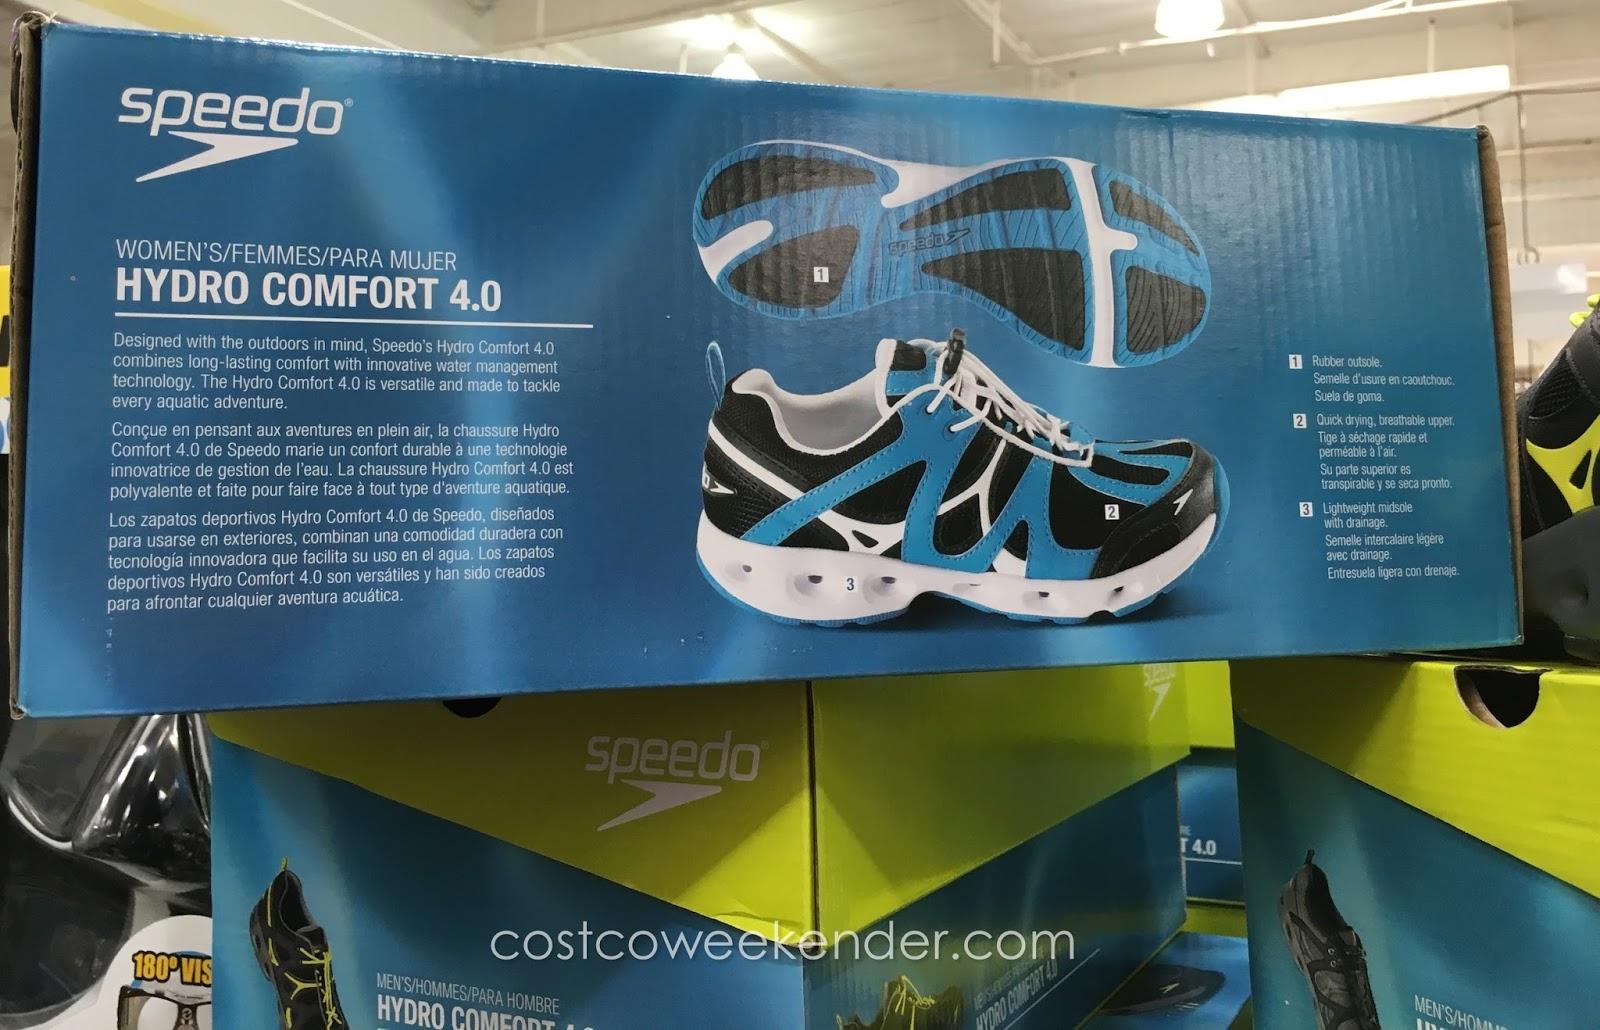 e082aff67296 Get your feet wet in the Speedo Ladies Hydro Comfort 4.0 Water Shoe